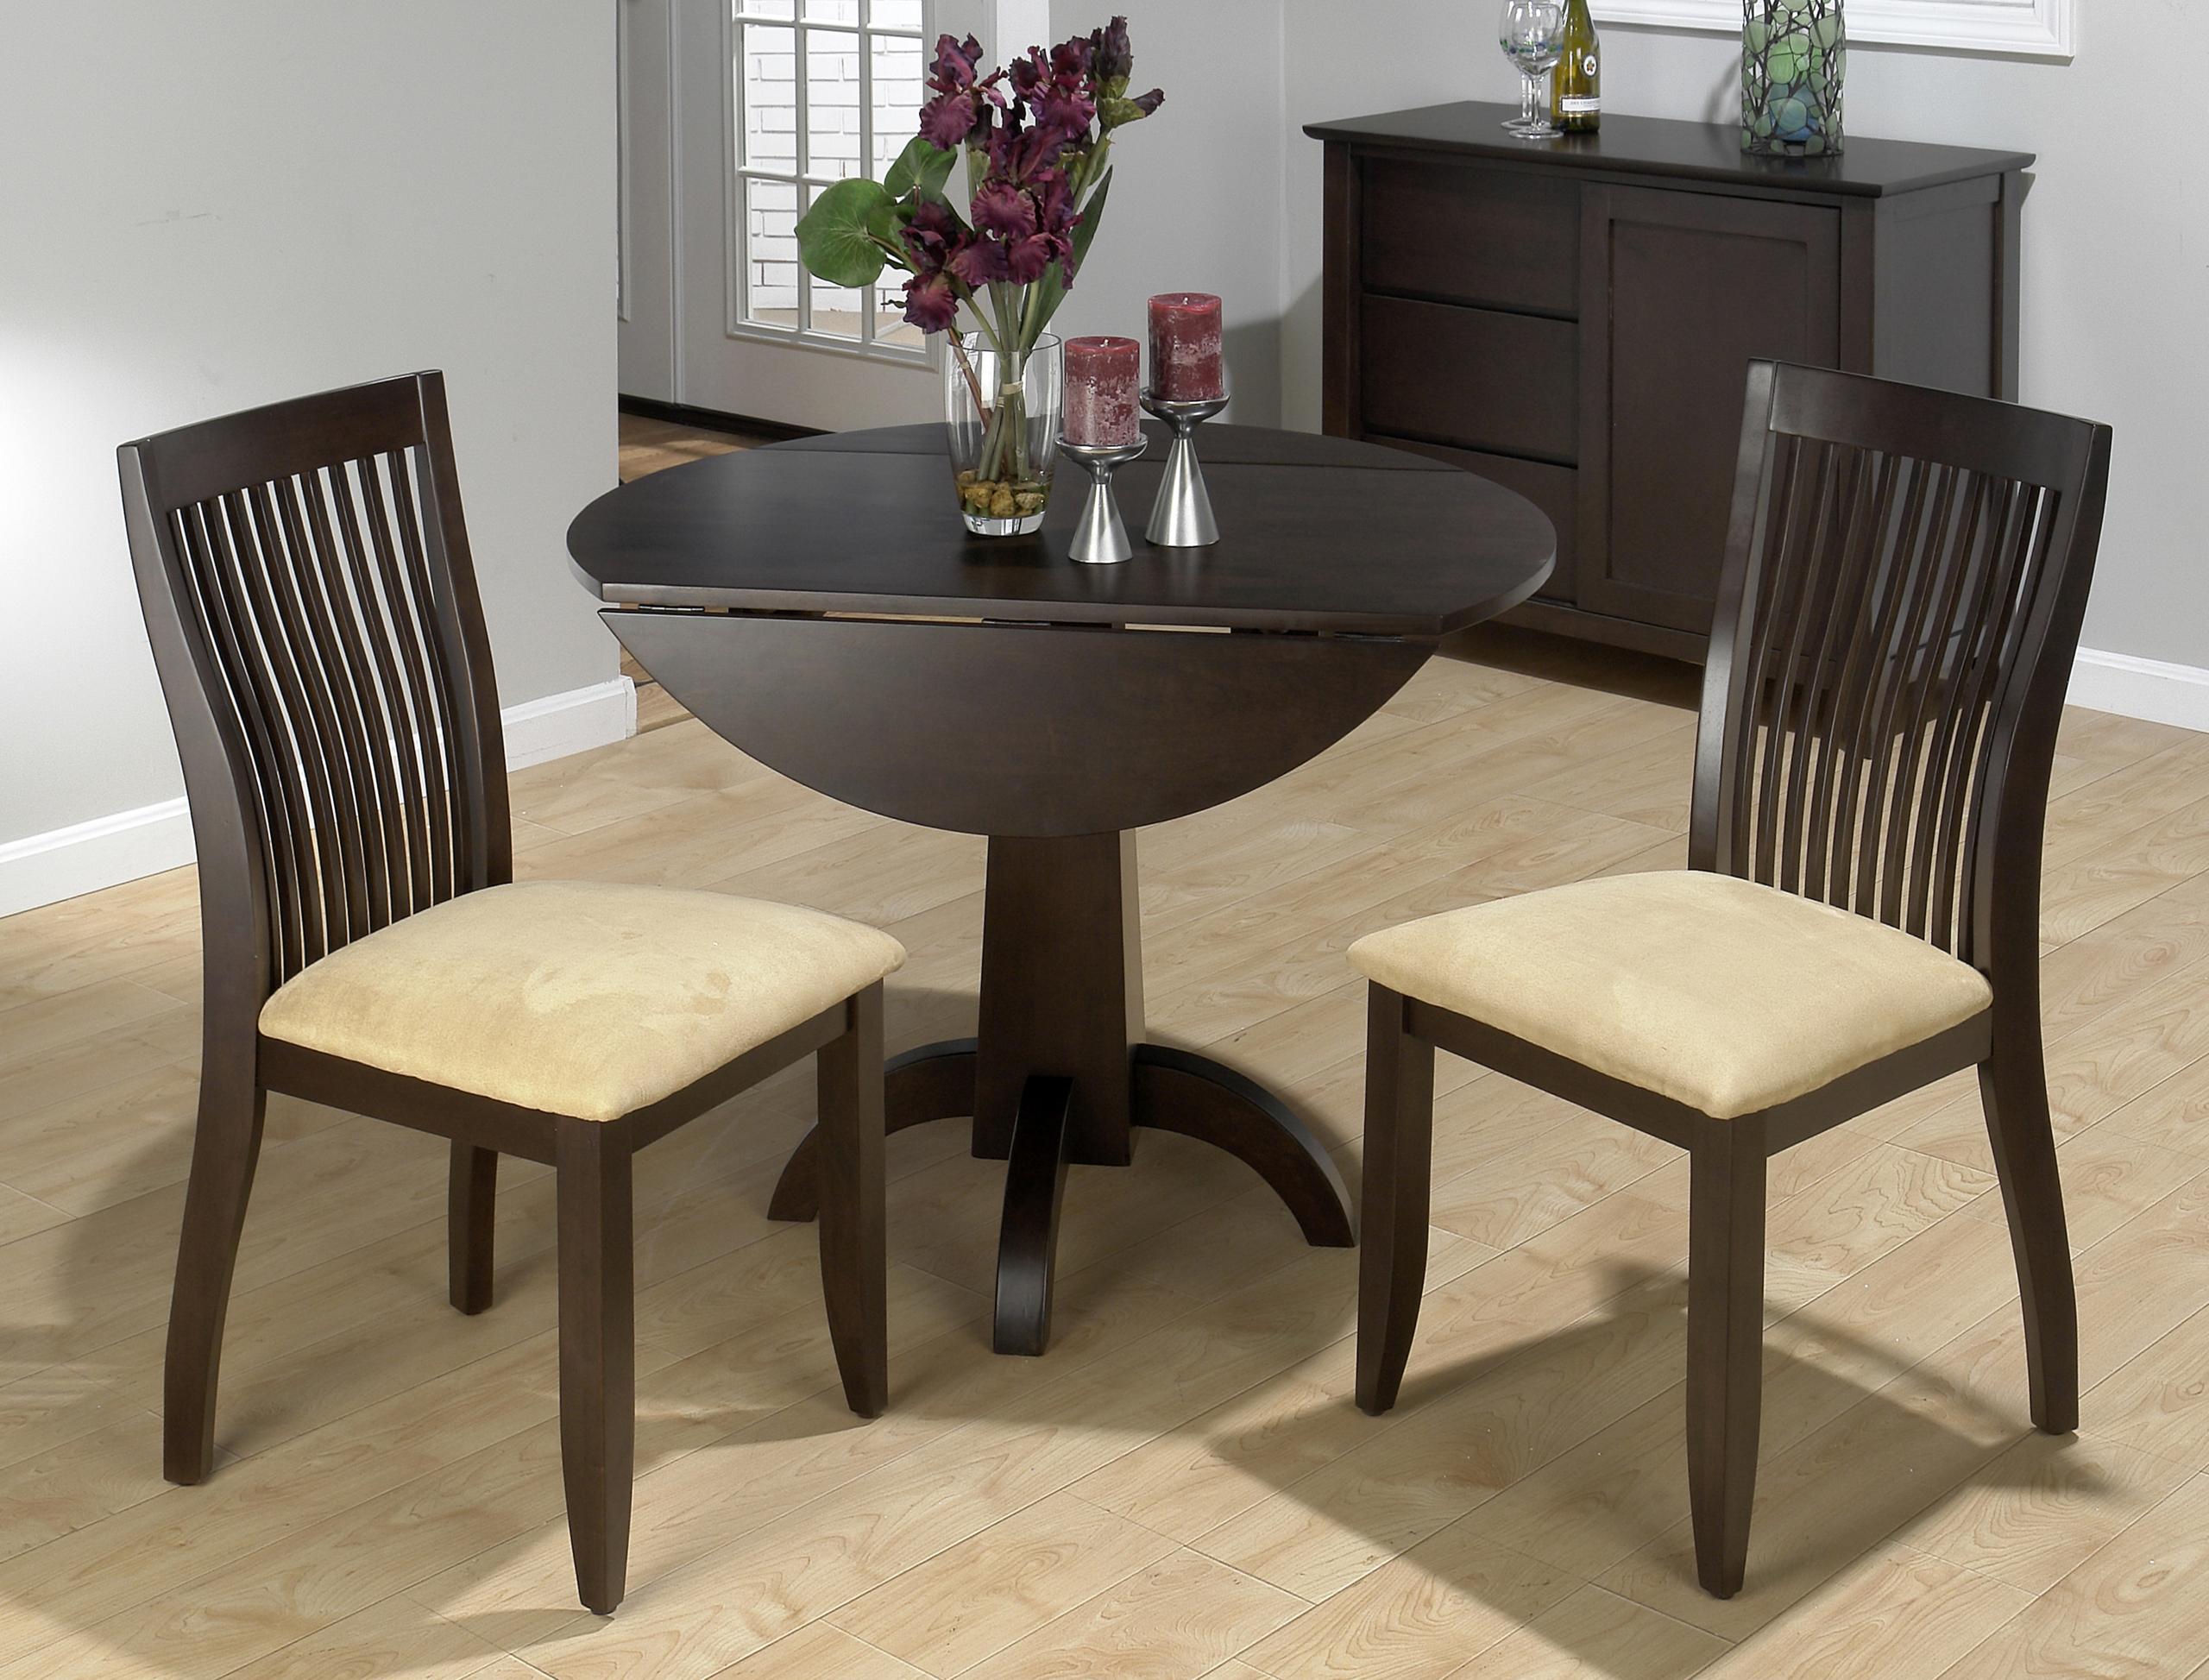 Delightful Indoor Bistro Table Sets